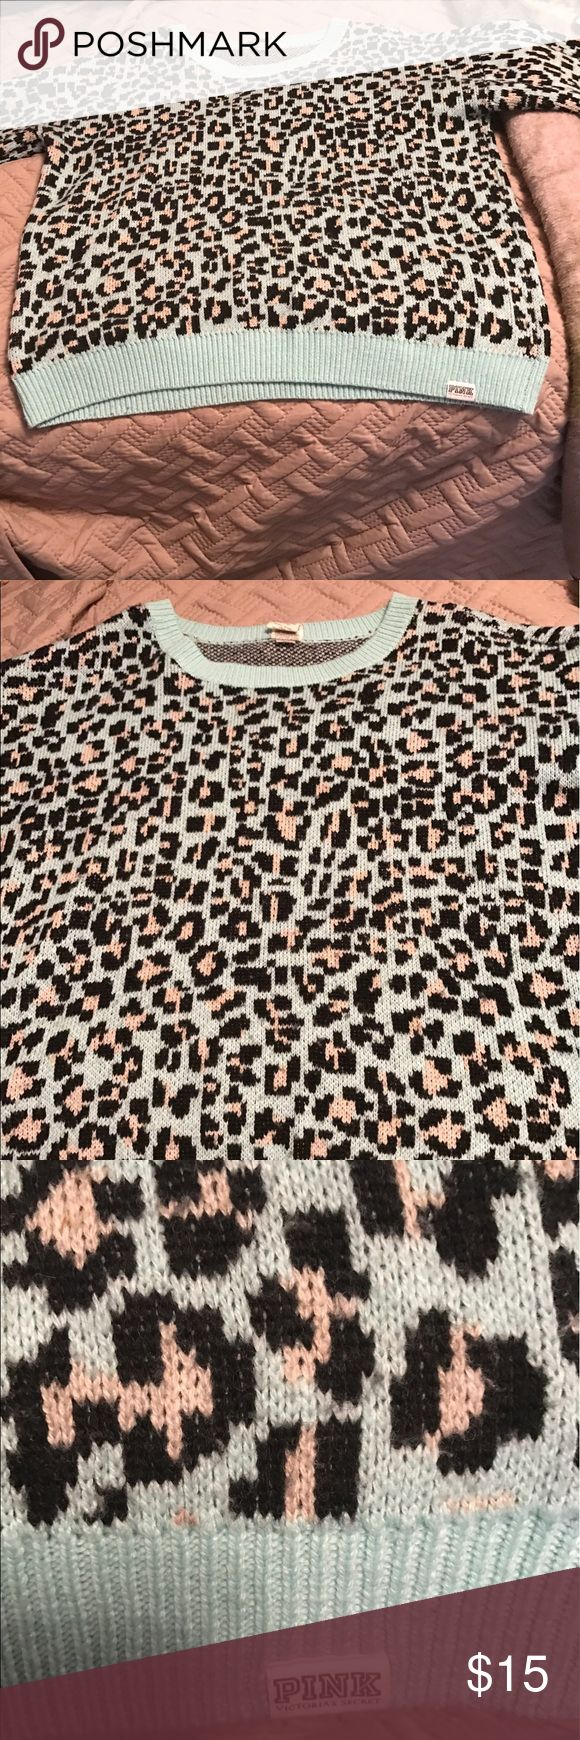 Victoria Secret PINK leopard sweater Preowned Reposh too big for me. Size large. Victoria Secret PINK Leopard sweater. So cute for the winter. PINK Victoria's Secret Sweaters Crew & Scoop Necks